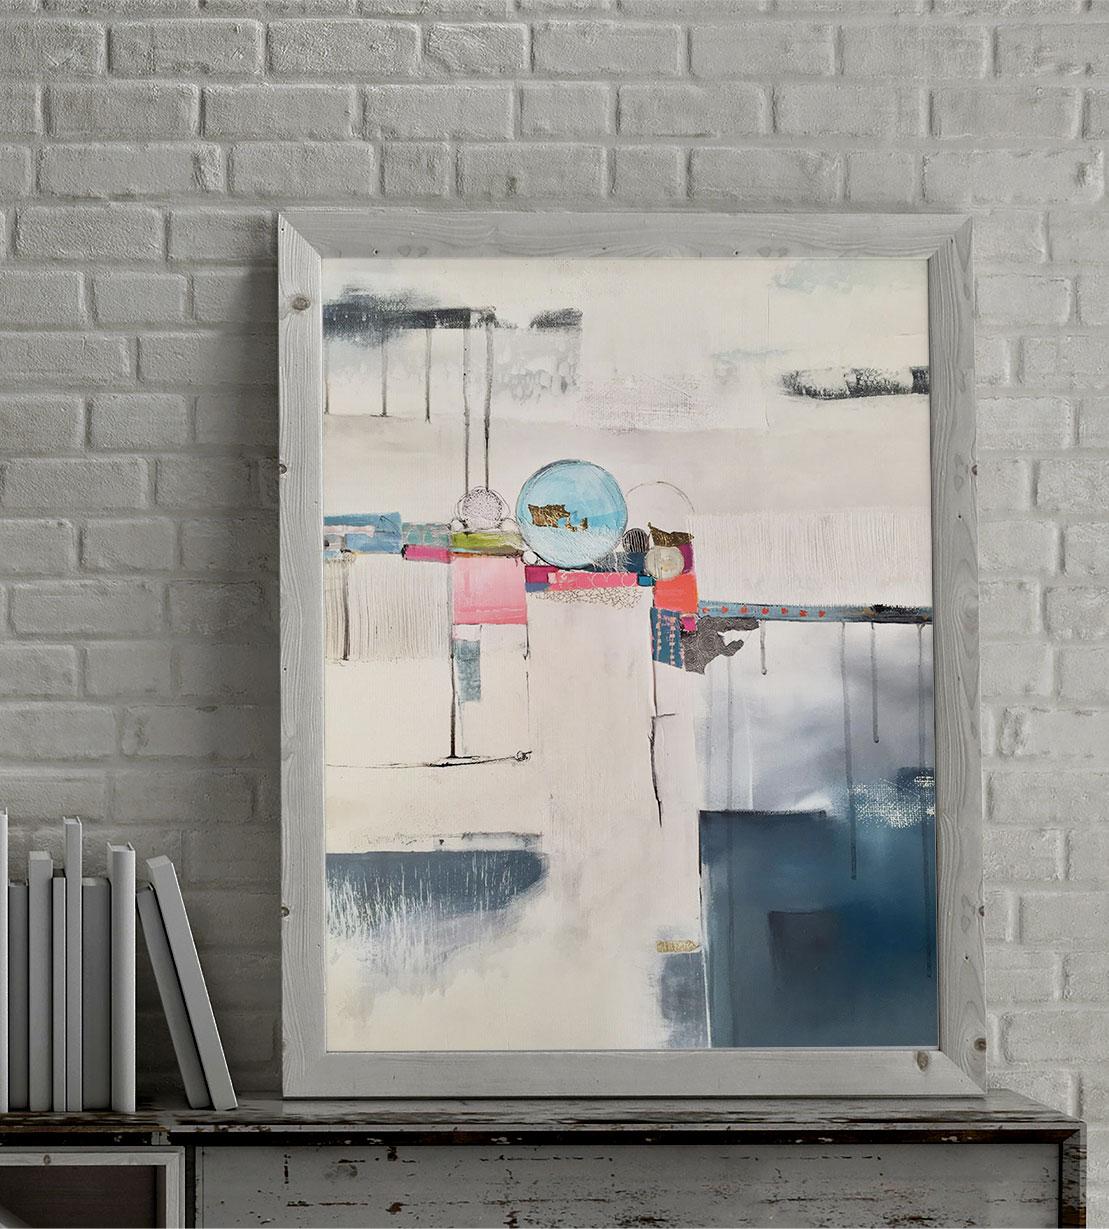 Don Carli Art abstrait Blou L'Astre 61x50cm-MockUp